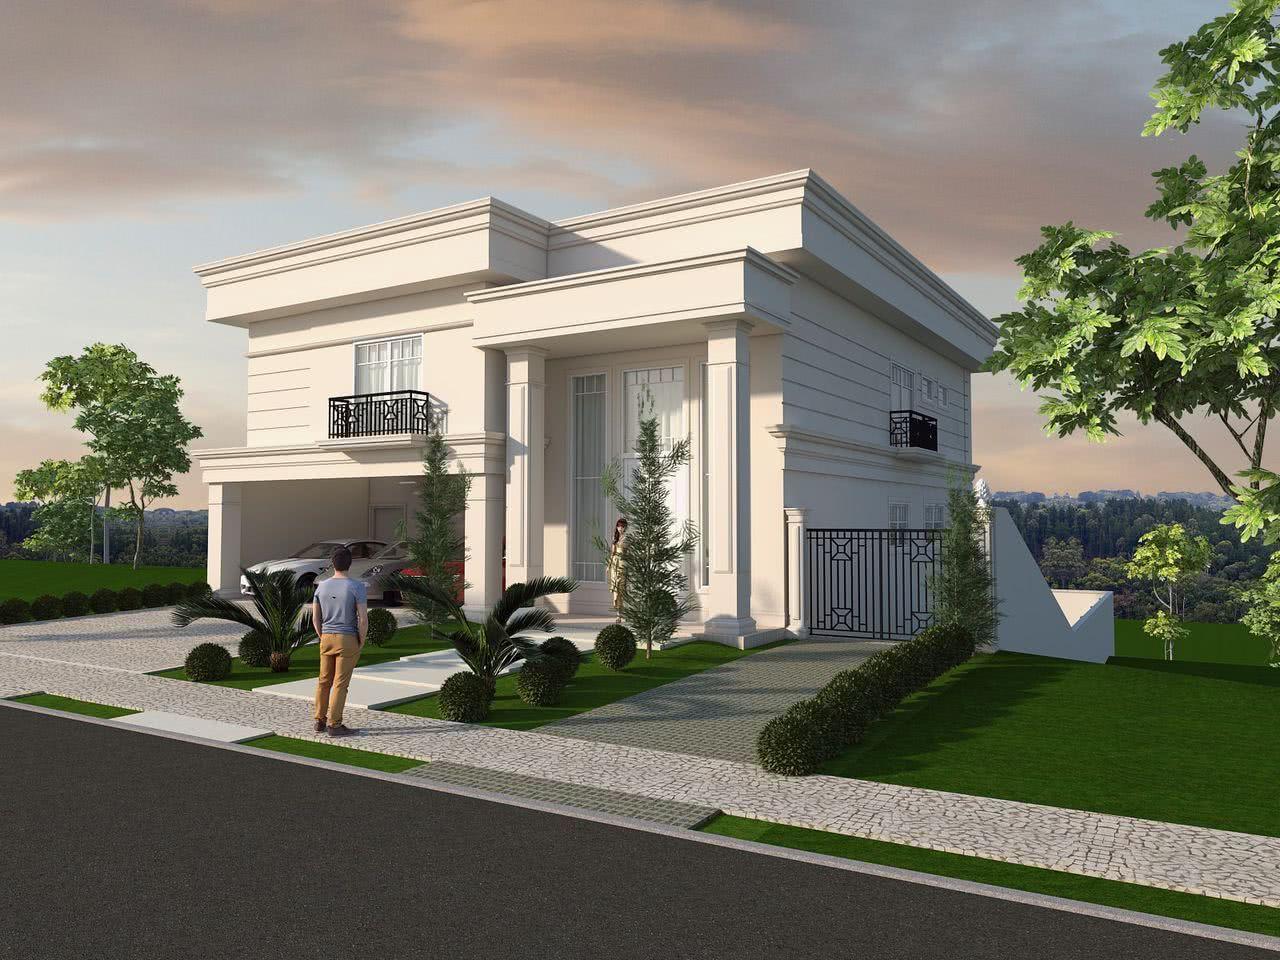 Casas estilo americano 65 projetos e fotos apaixonantes for Fachada de casas modernas estilo oriental